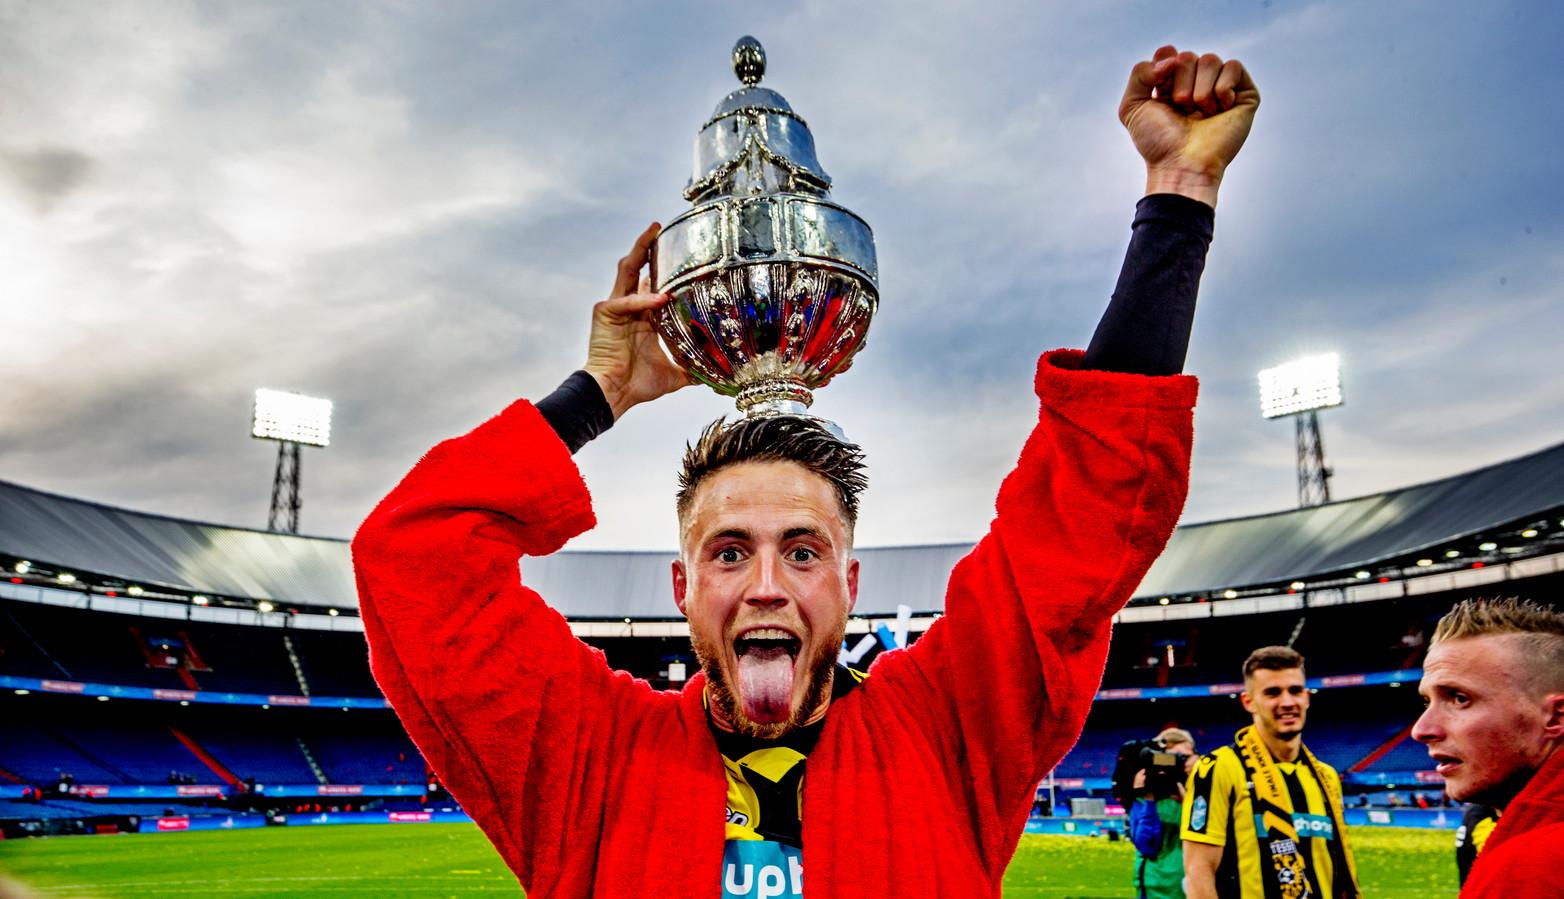 Ricky van Wolfswinkel met de KNVB-beker in 2017.